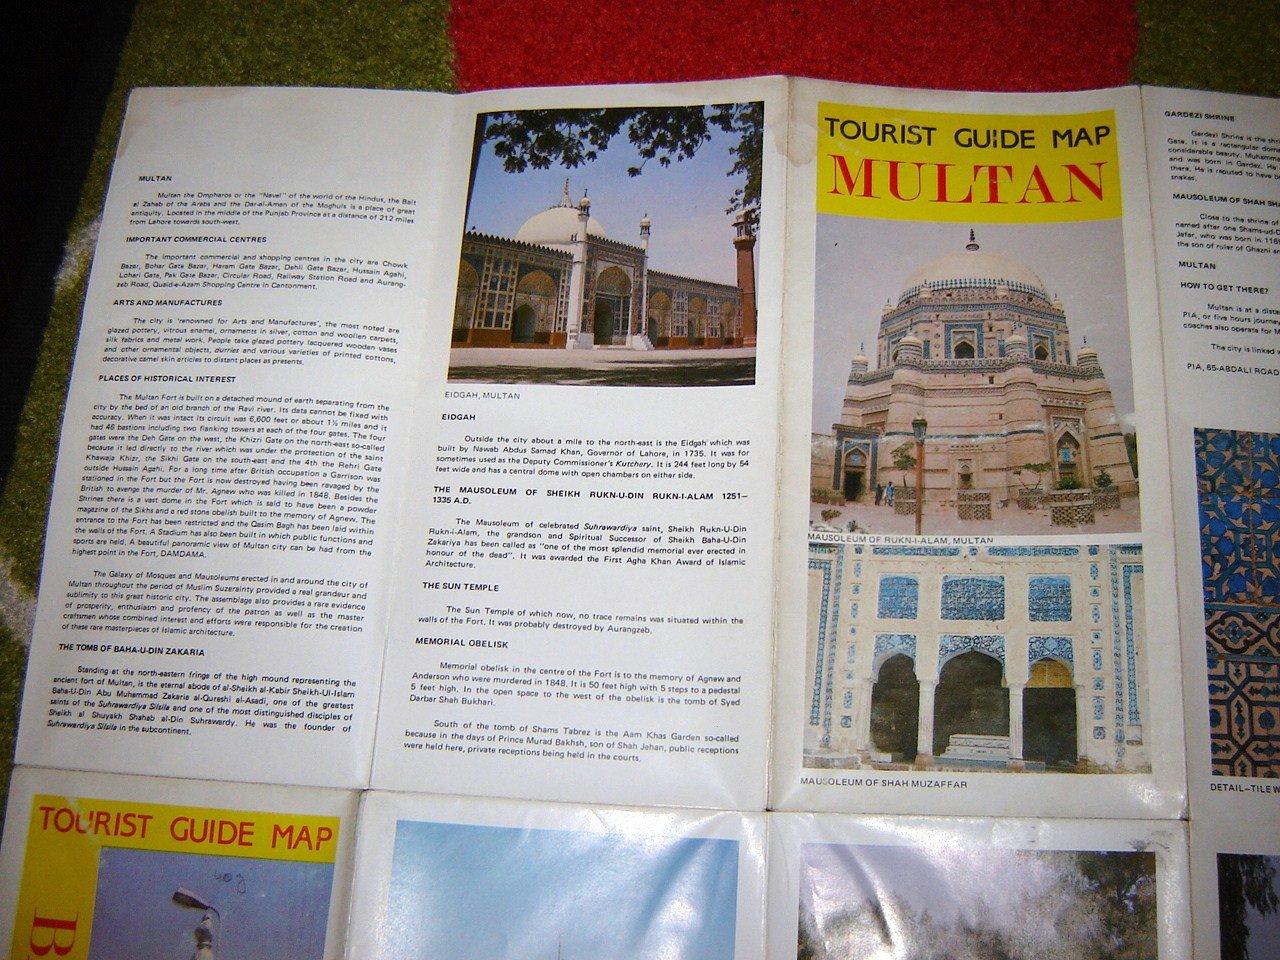 Tourist Guide Map of MULTAN and BAHAWALPUR cities of Pakistan